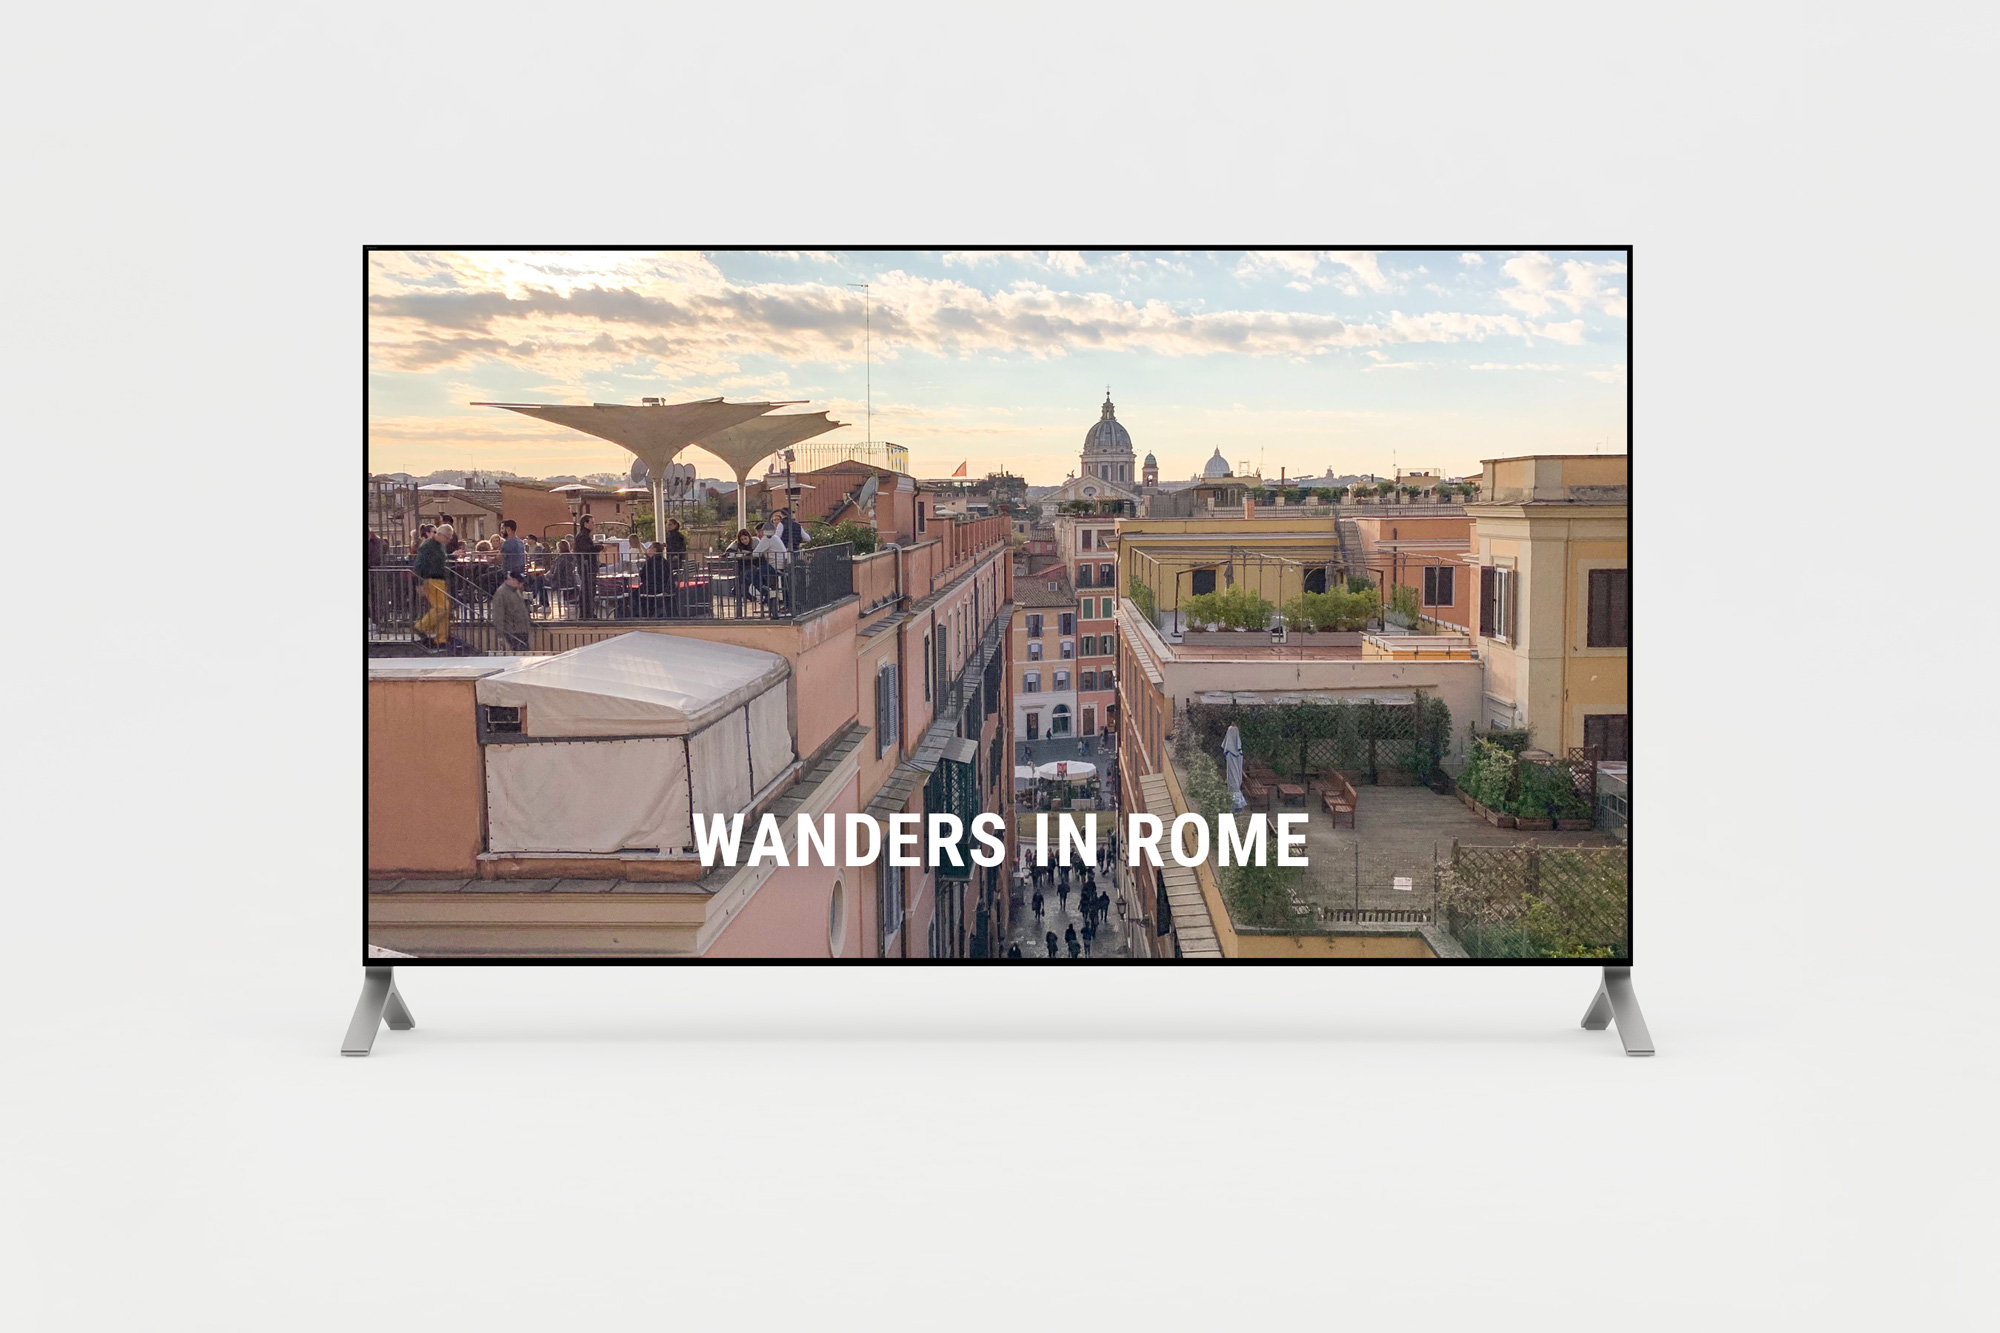 Short film of wanders in Rome